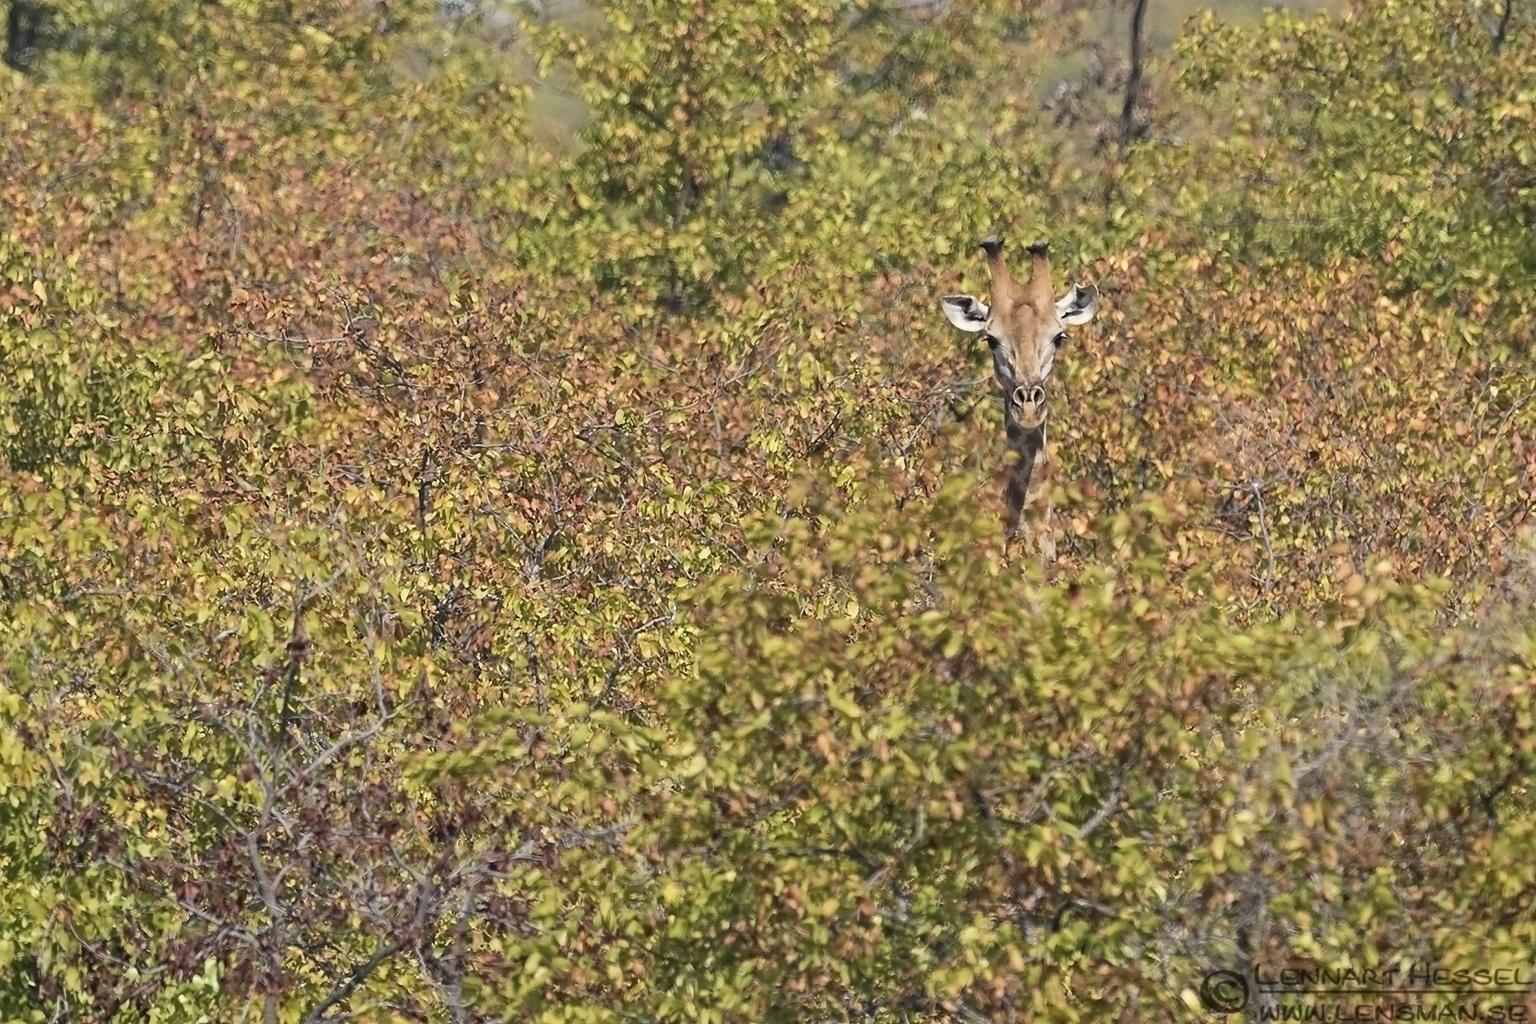 Giraffe in habitat Kruger National Park South Africa